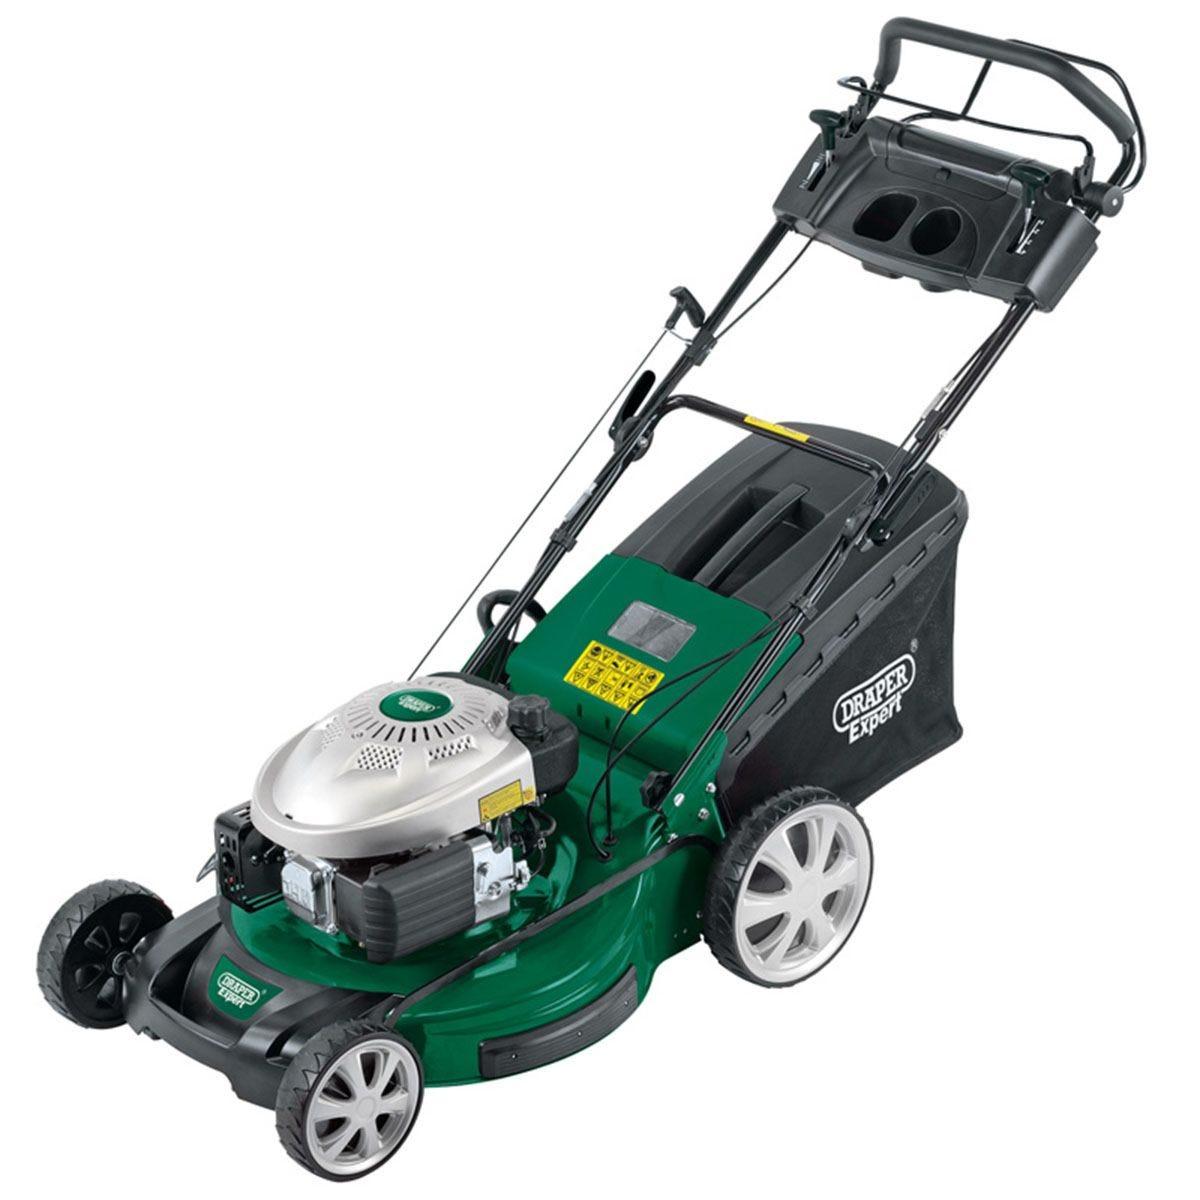 Draper 3-in-1 560mm Self-Propelled Petrol Lawn Mower (173cc/4.9HP) - Green and Black